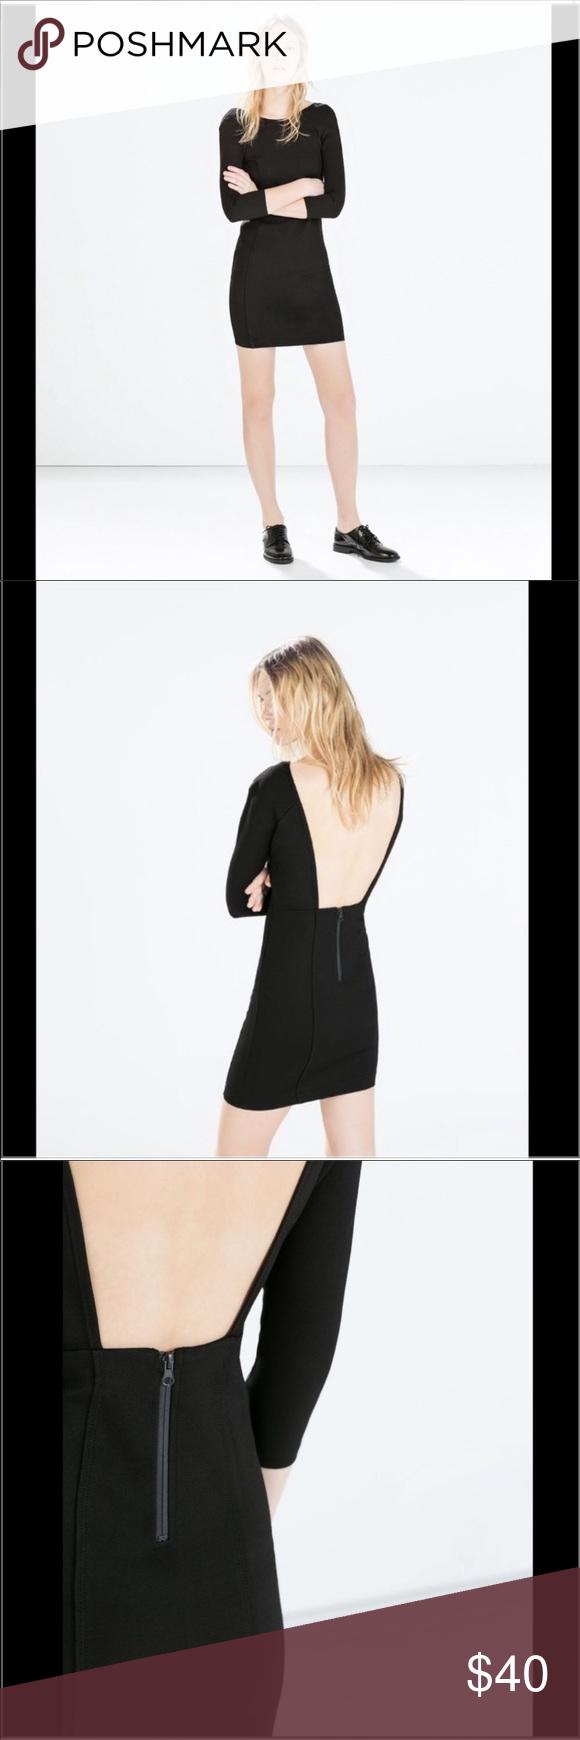 Nwot Zara Black Open Back Dress Zara Black Open Back Dress Zipper In Back Thick Stretch Material Similar Open Back Black Dress Dress Backs Open Back Dresses [ 1740 x 580 Pixel ]